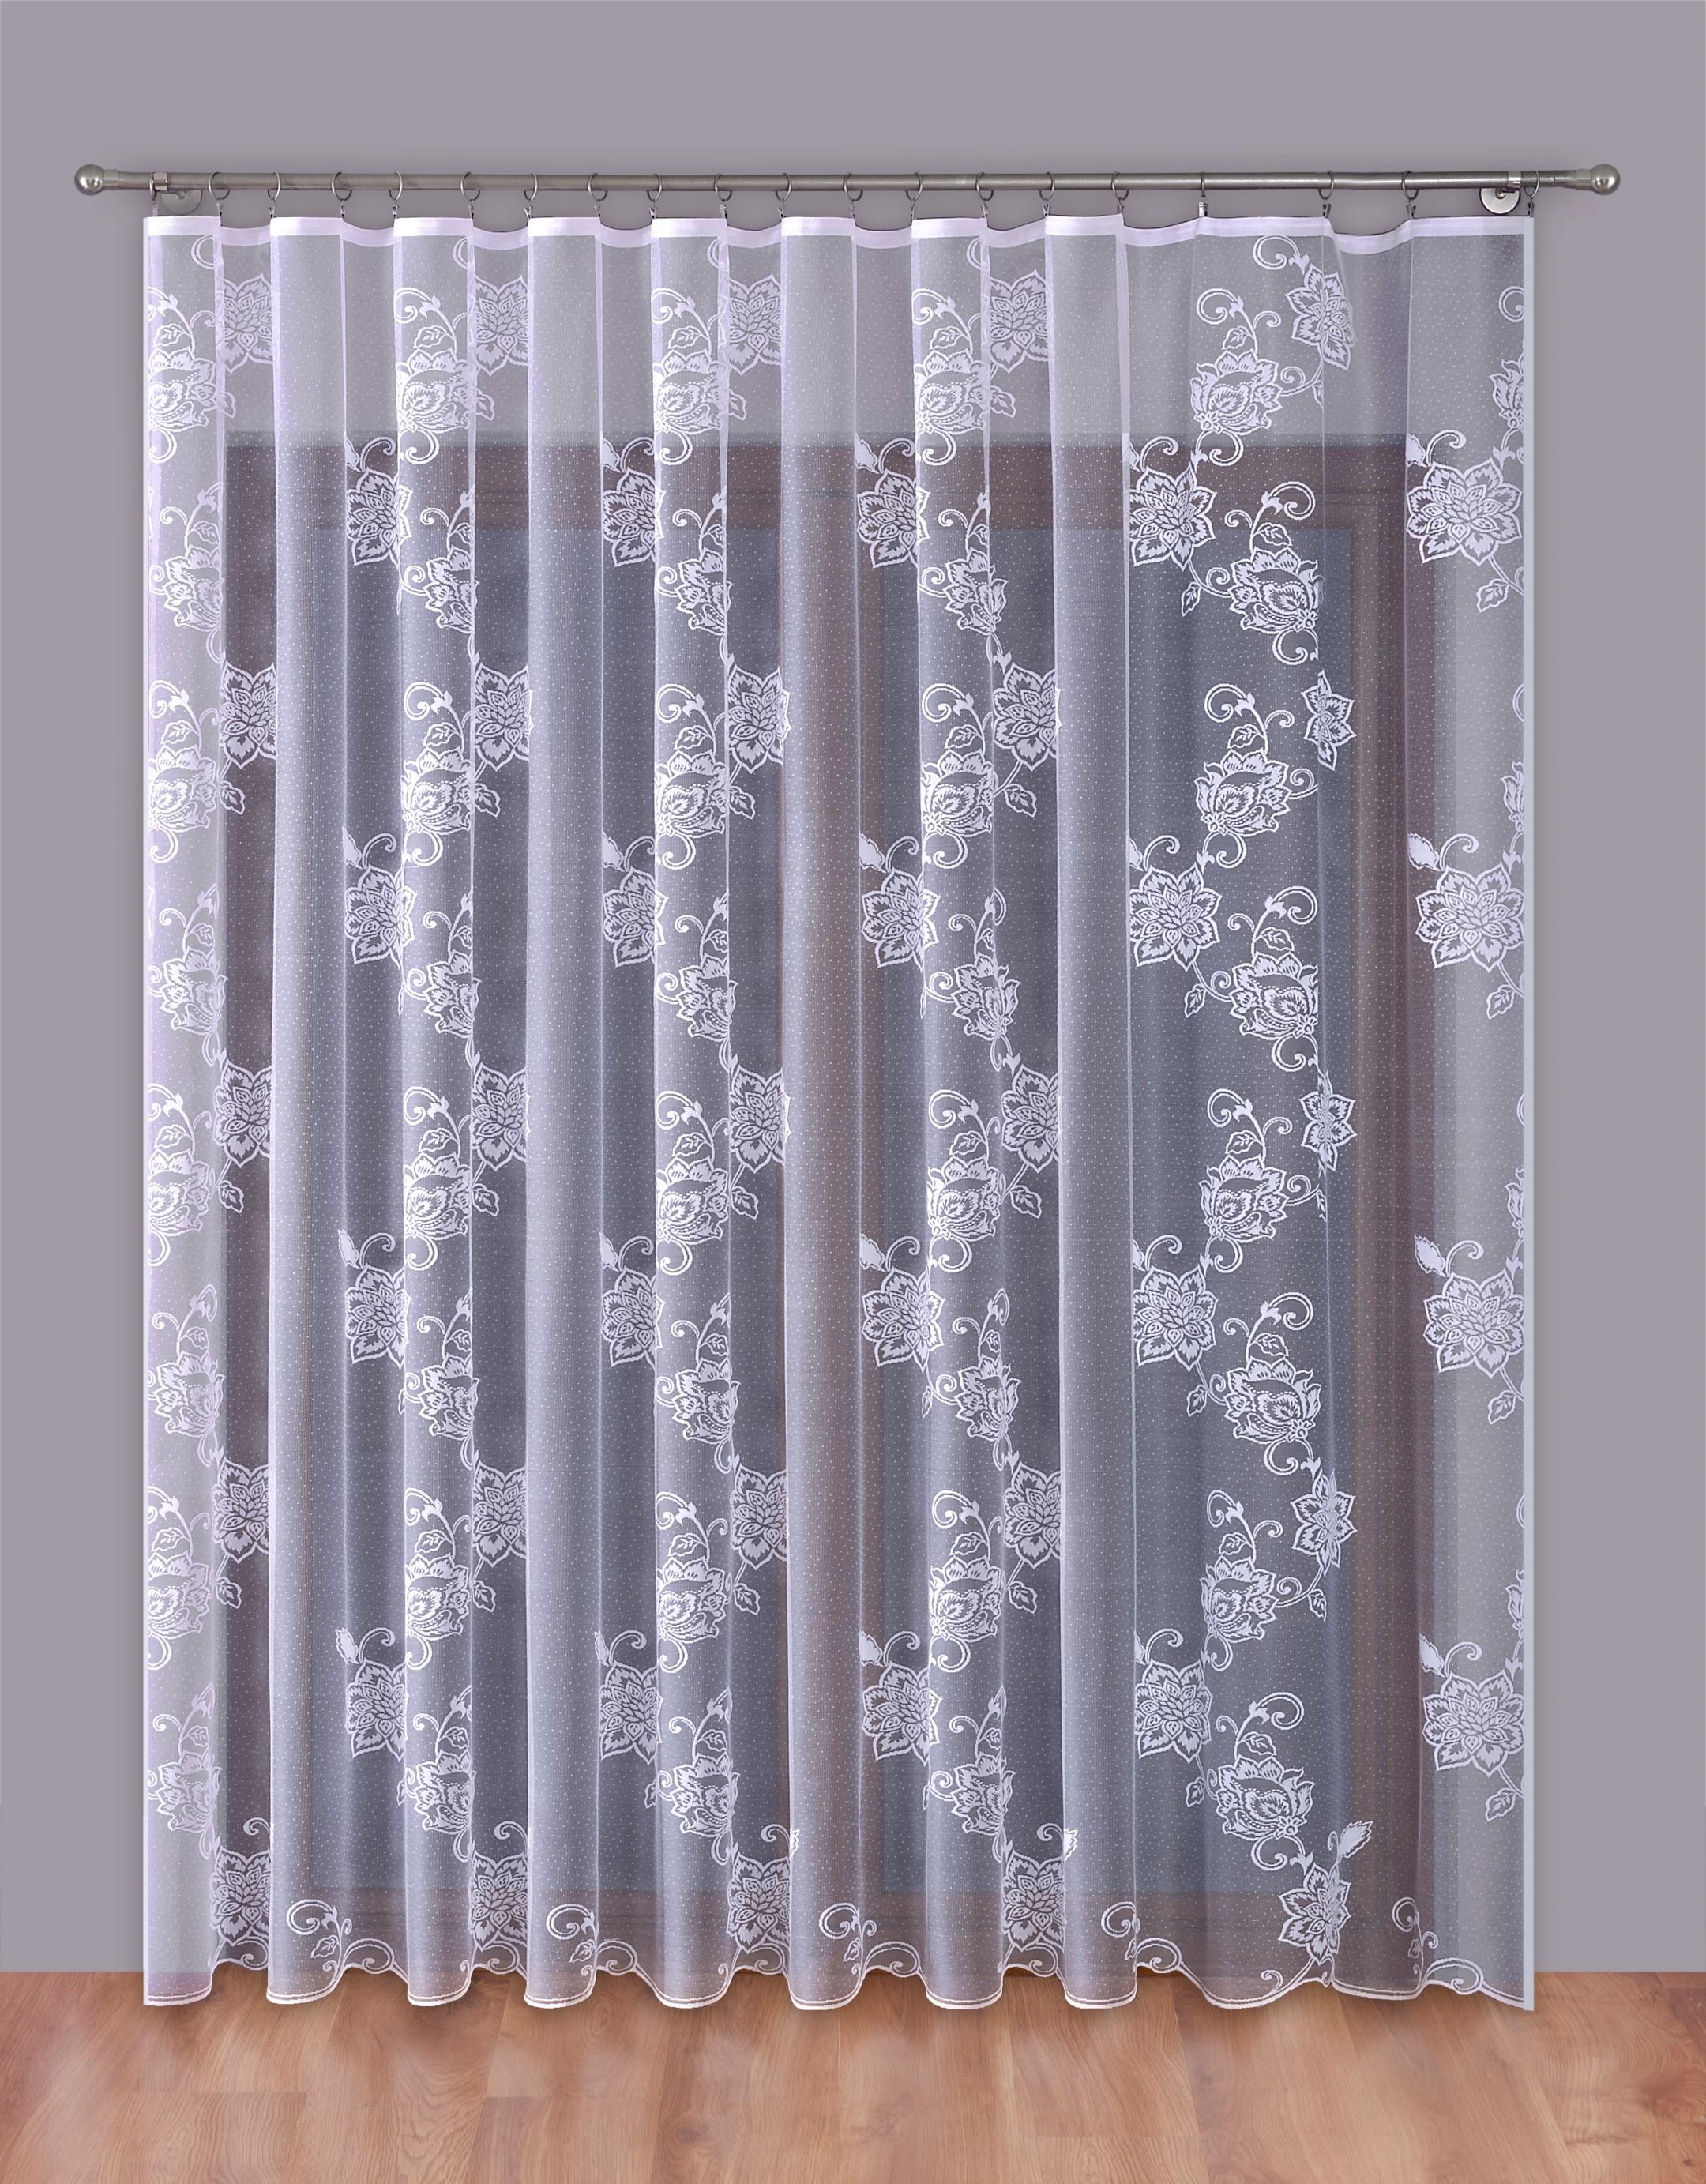 Шторы Primavera Классические шторы Innes Цвет: Белый шторы primavera классические шторы maev цвет салатовый